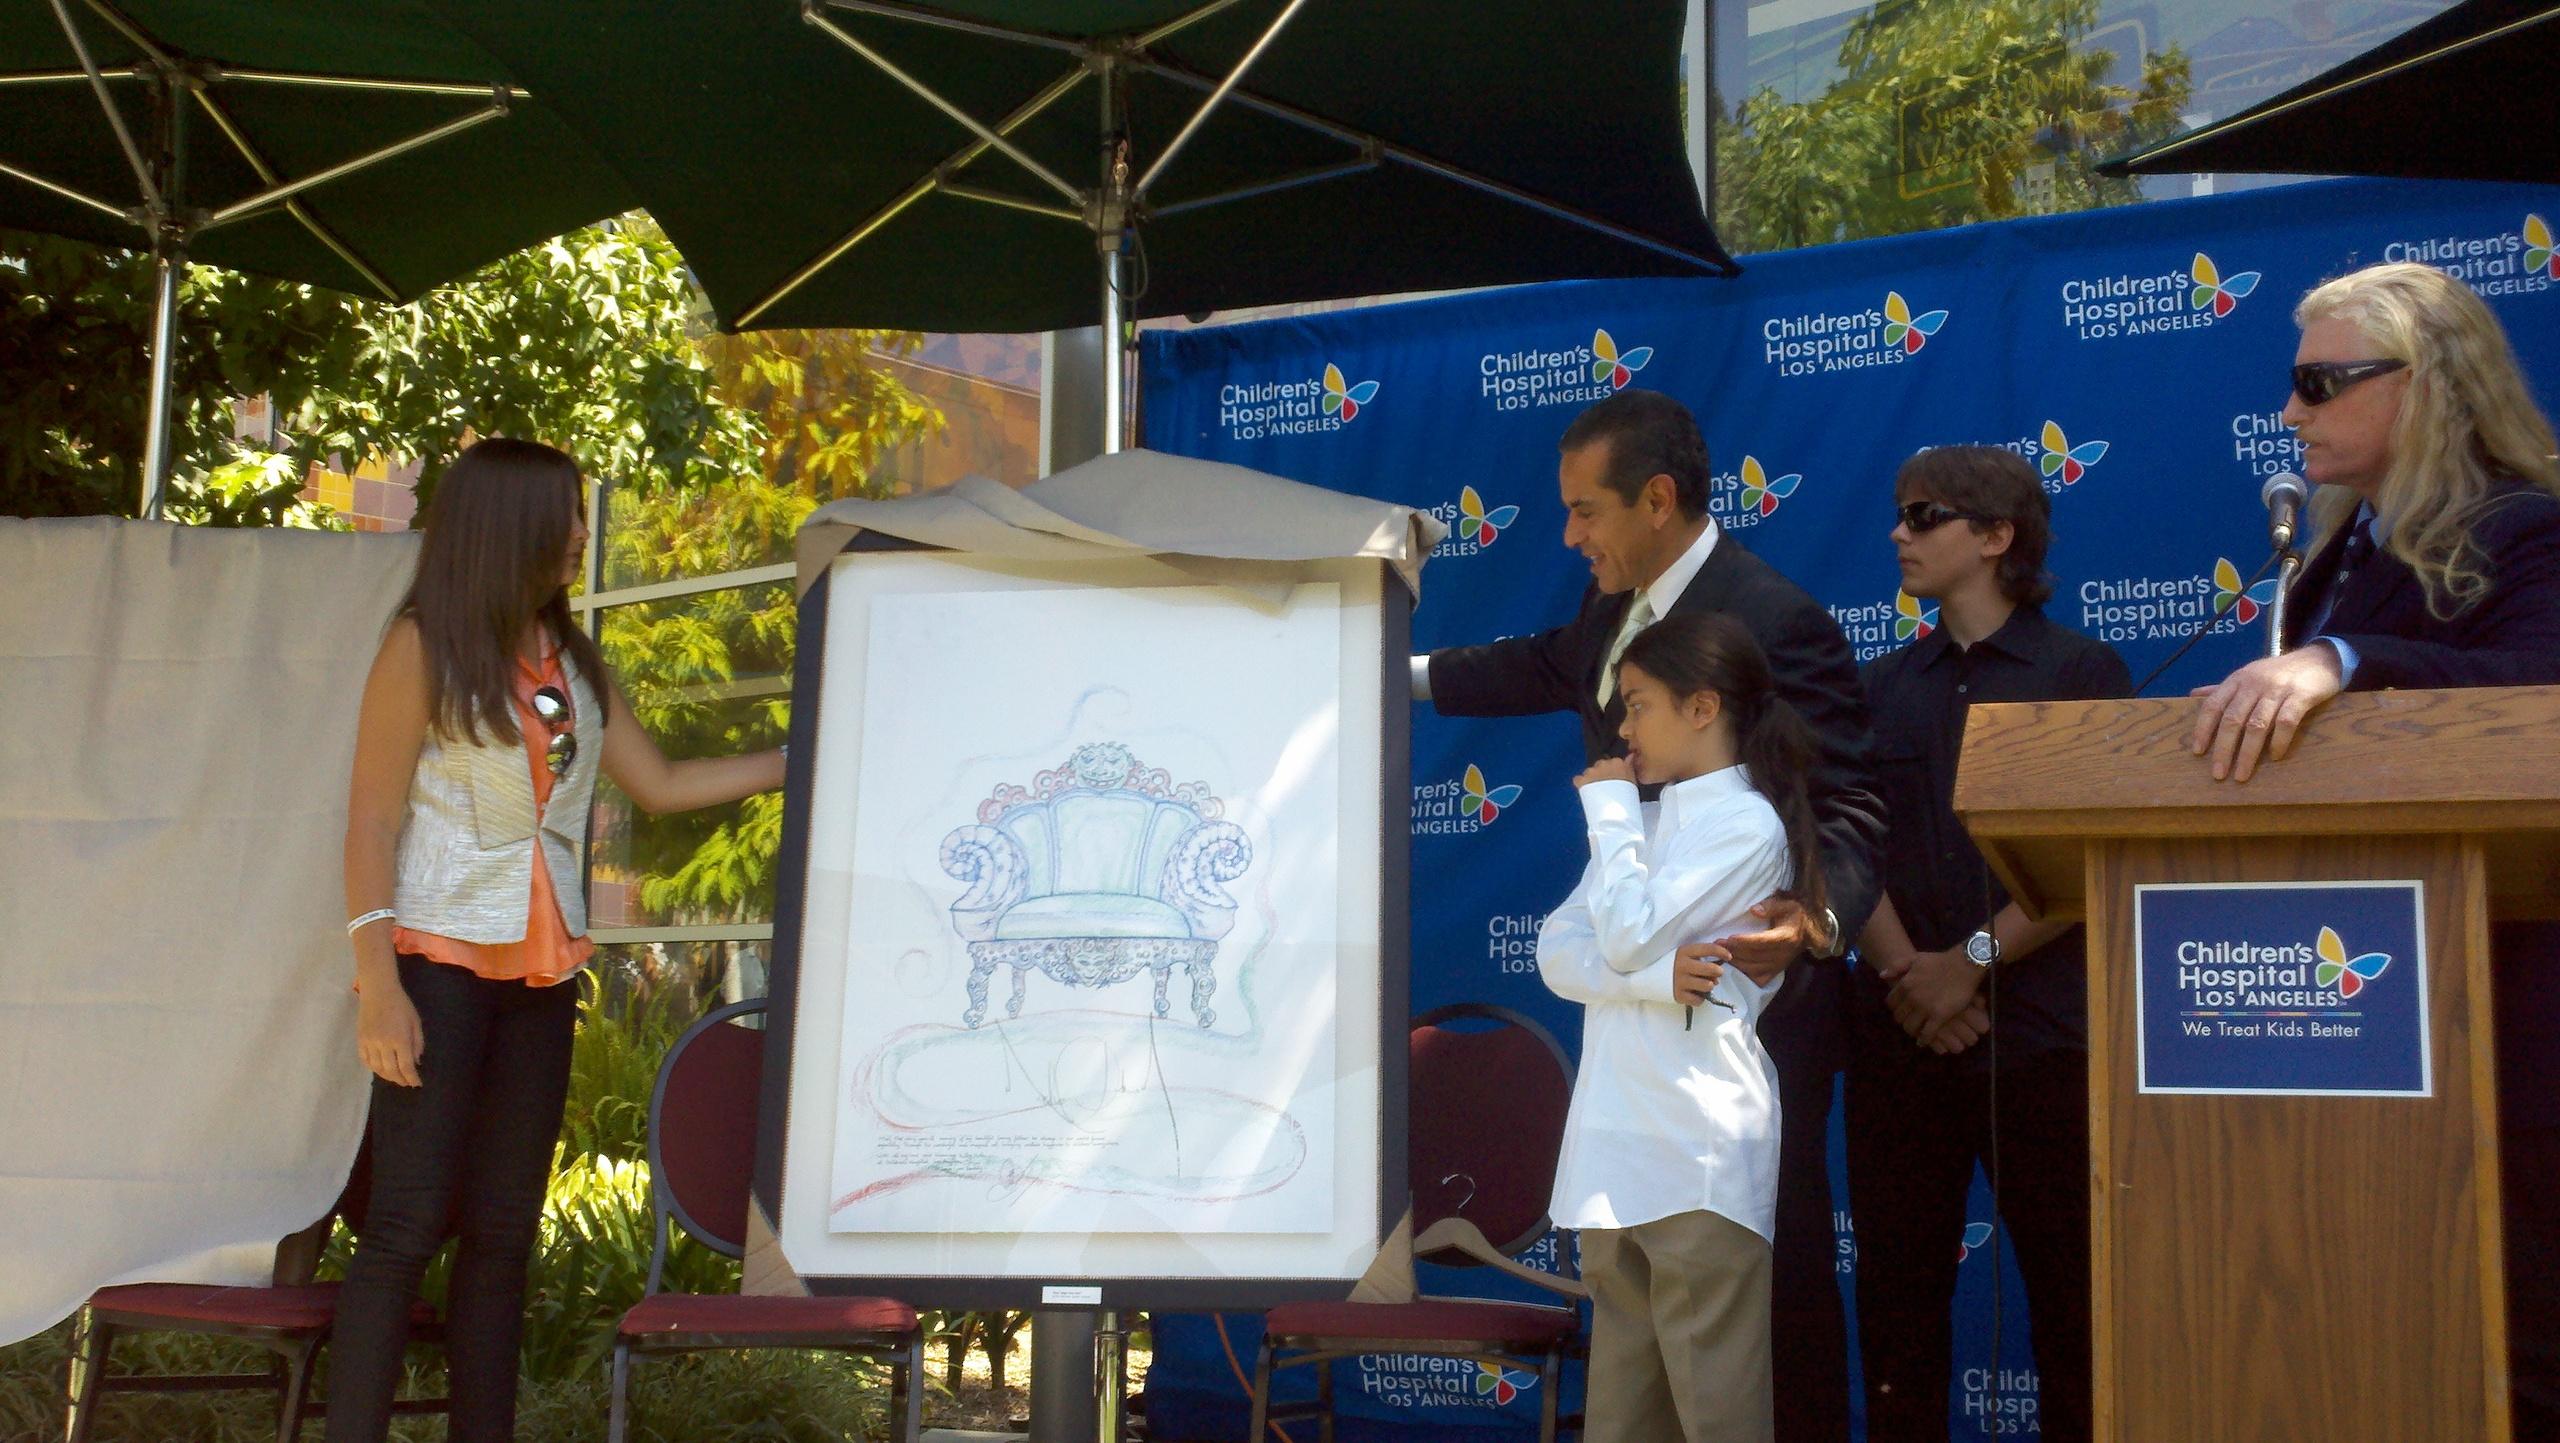 MJ's kids unveil Michael's art work for Children's Hospital LA